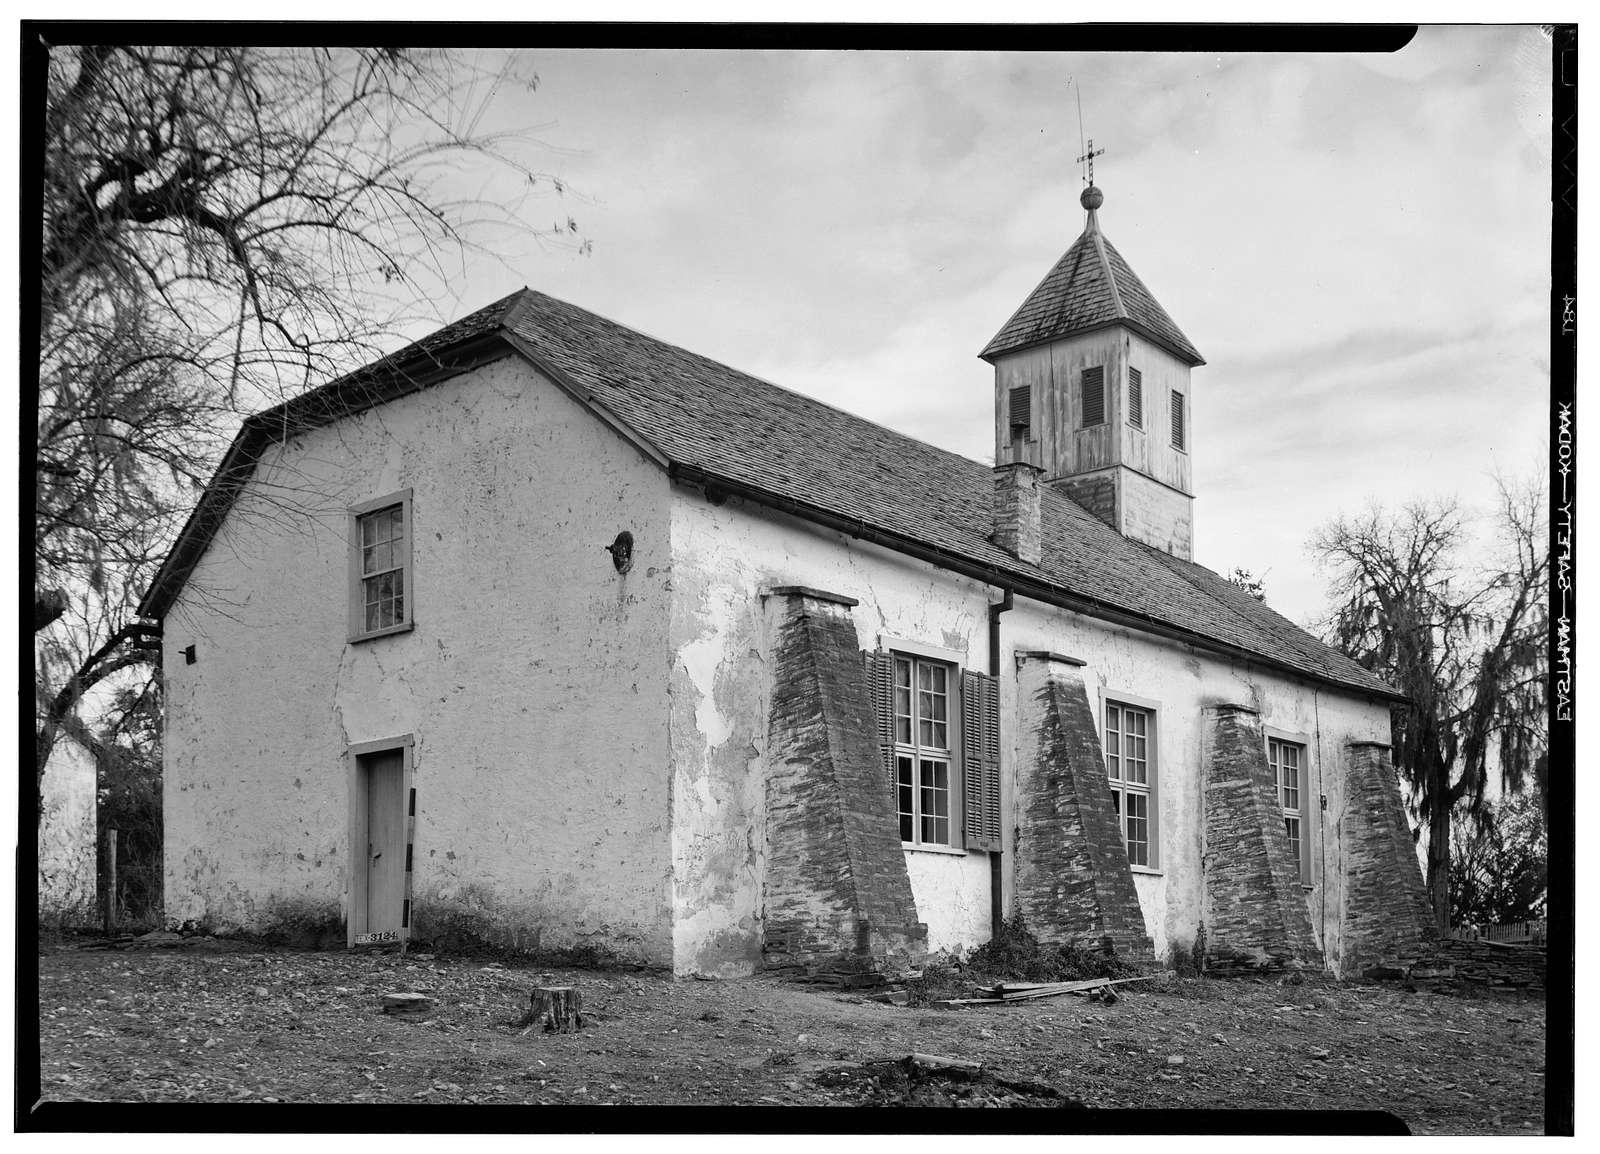 Bethlehem Lutheran Church, White Street, Round Top, Fayette County, TX